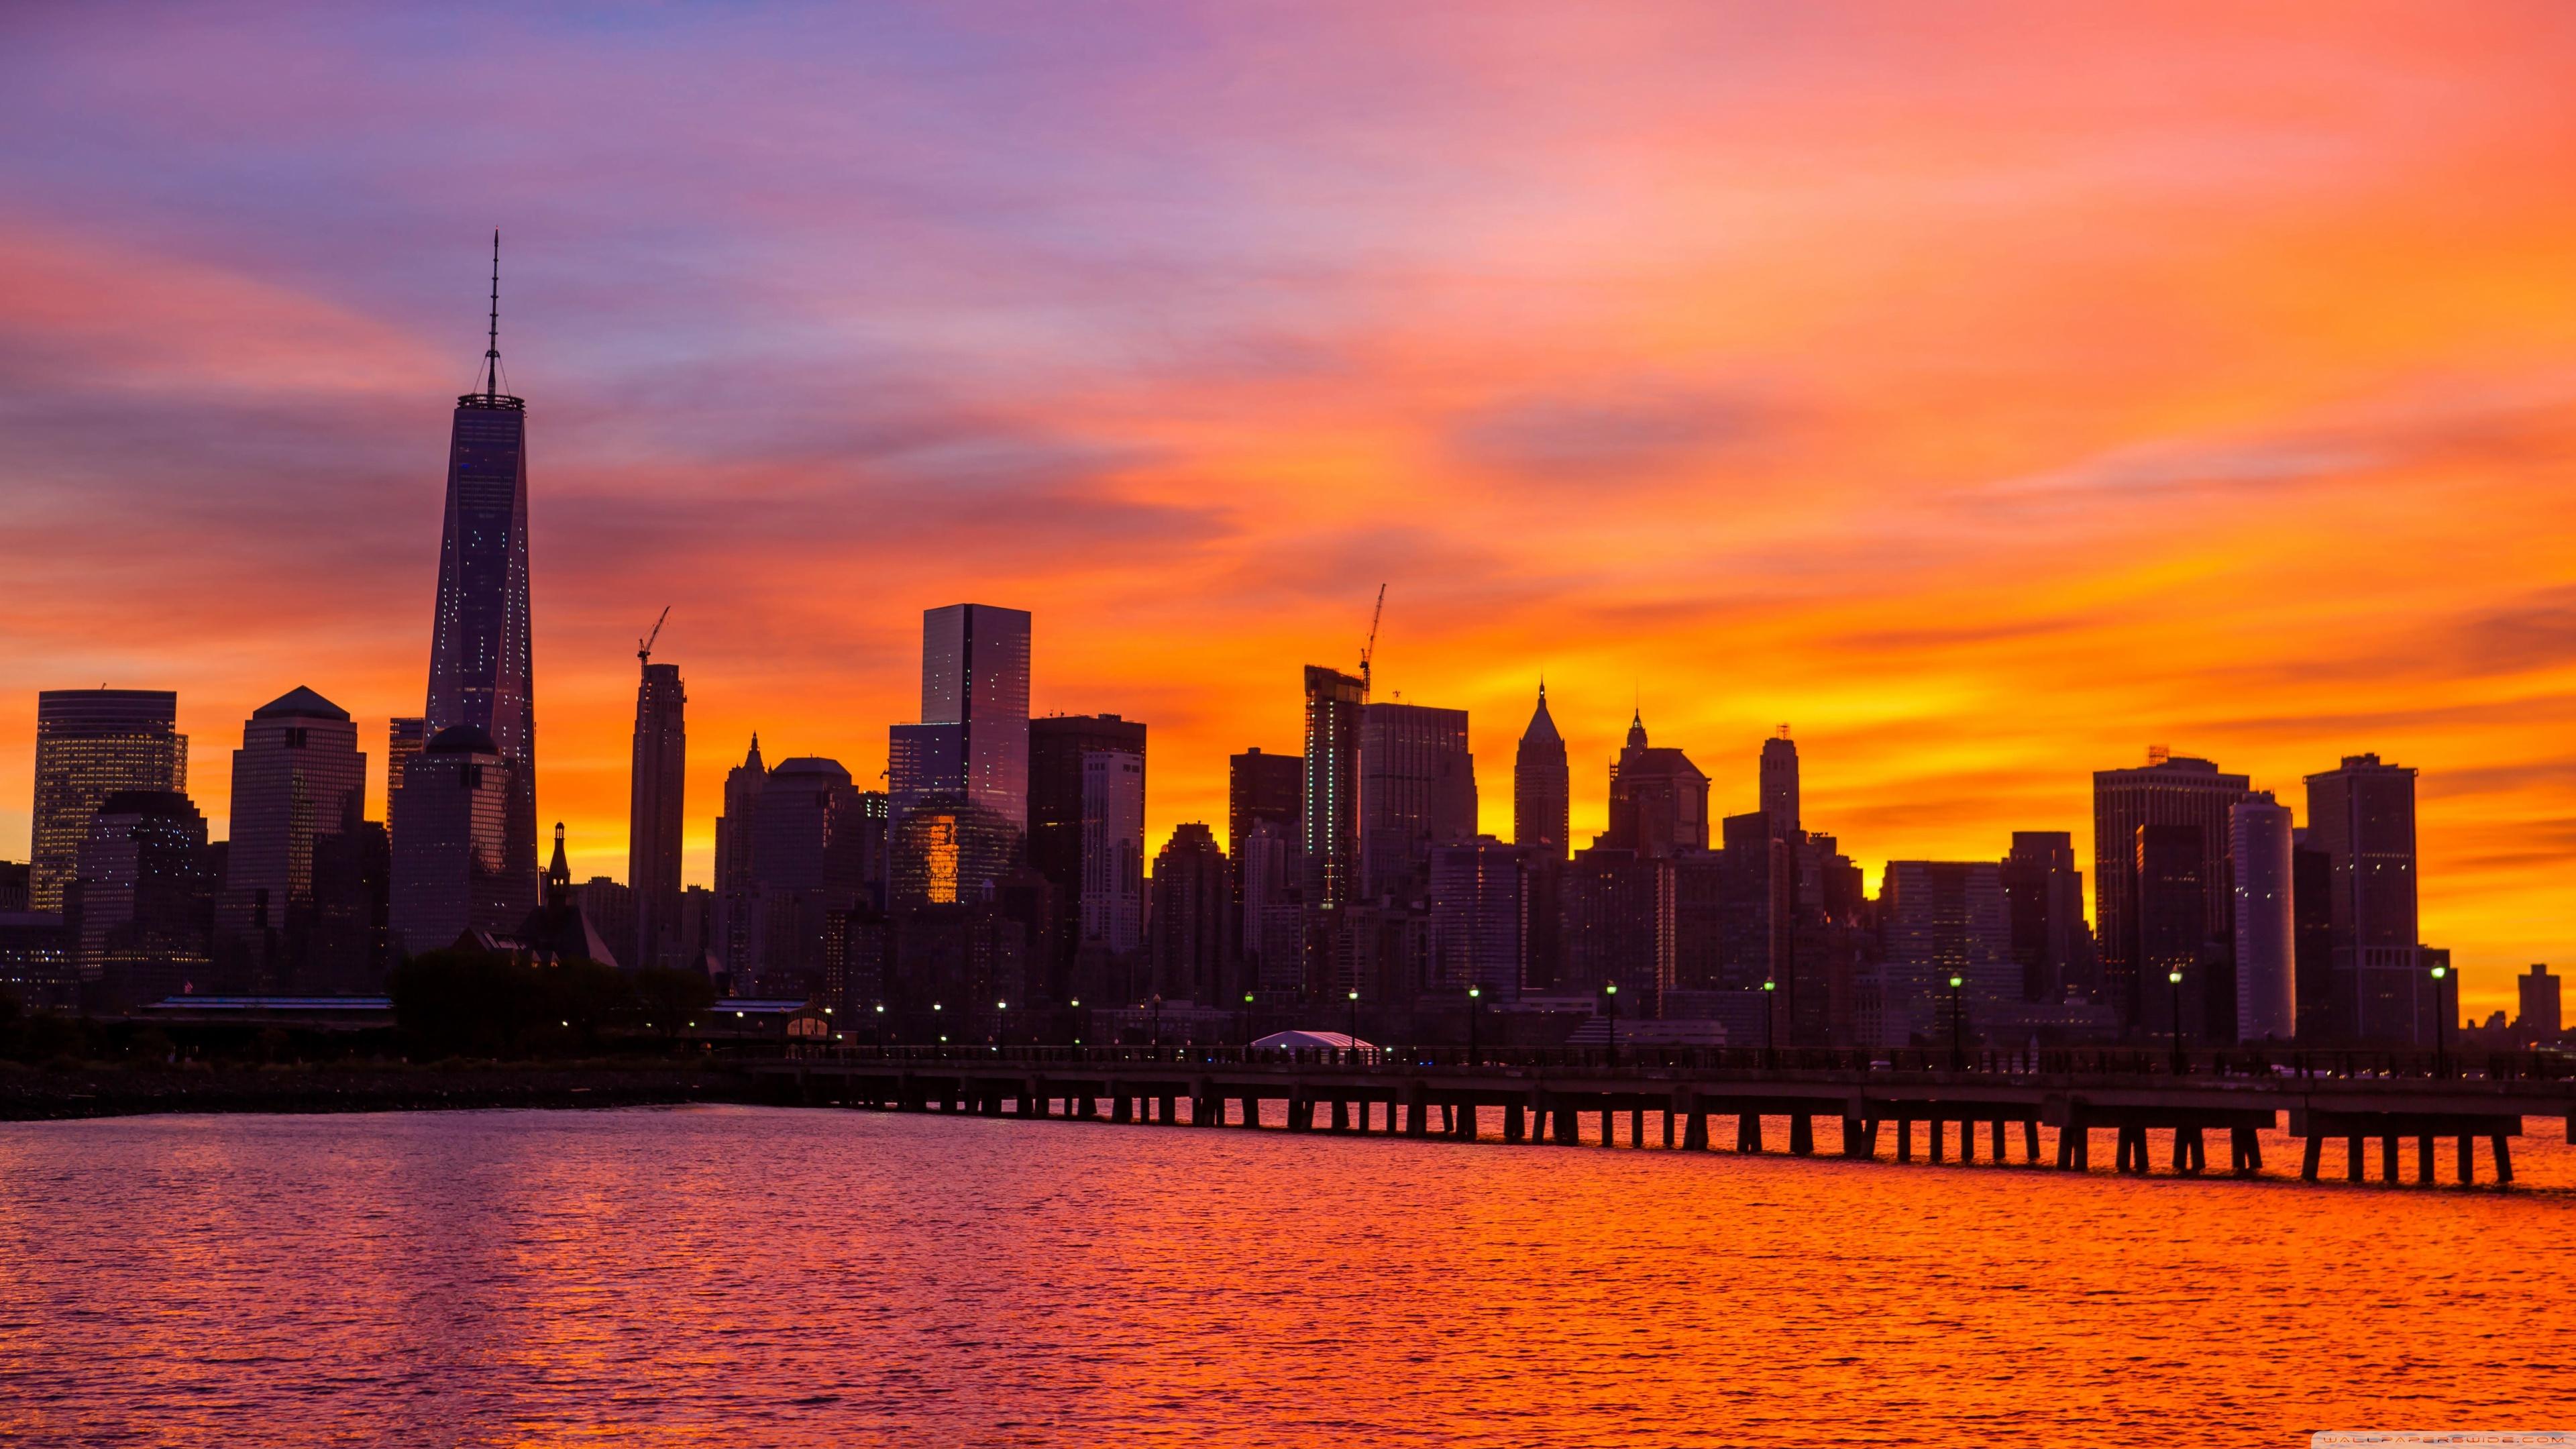 New York City 4k Wallpaper Posted By Samantha Mercado